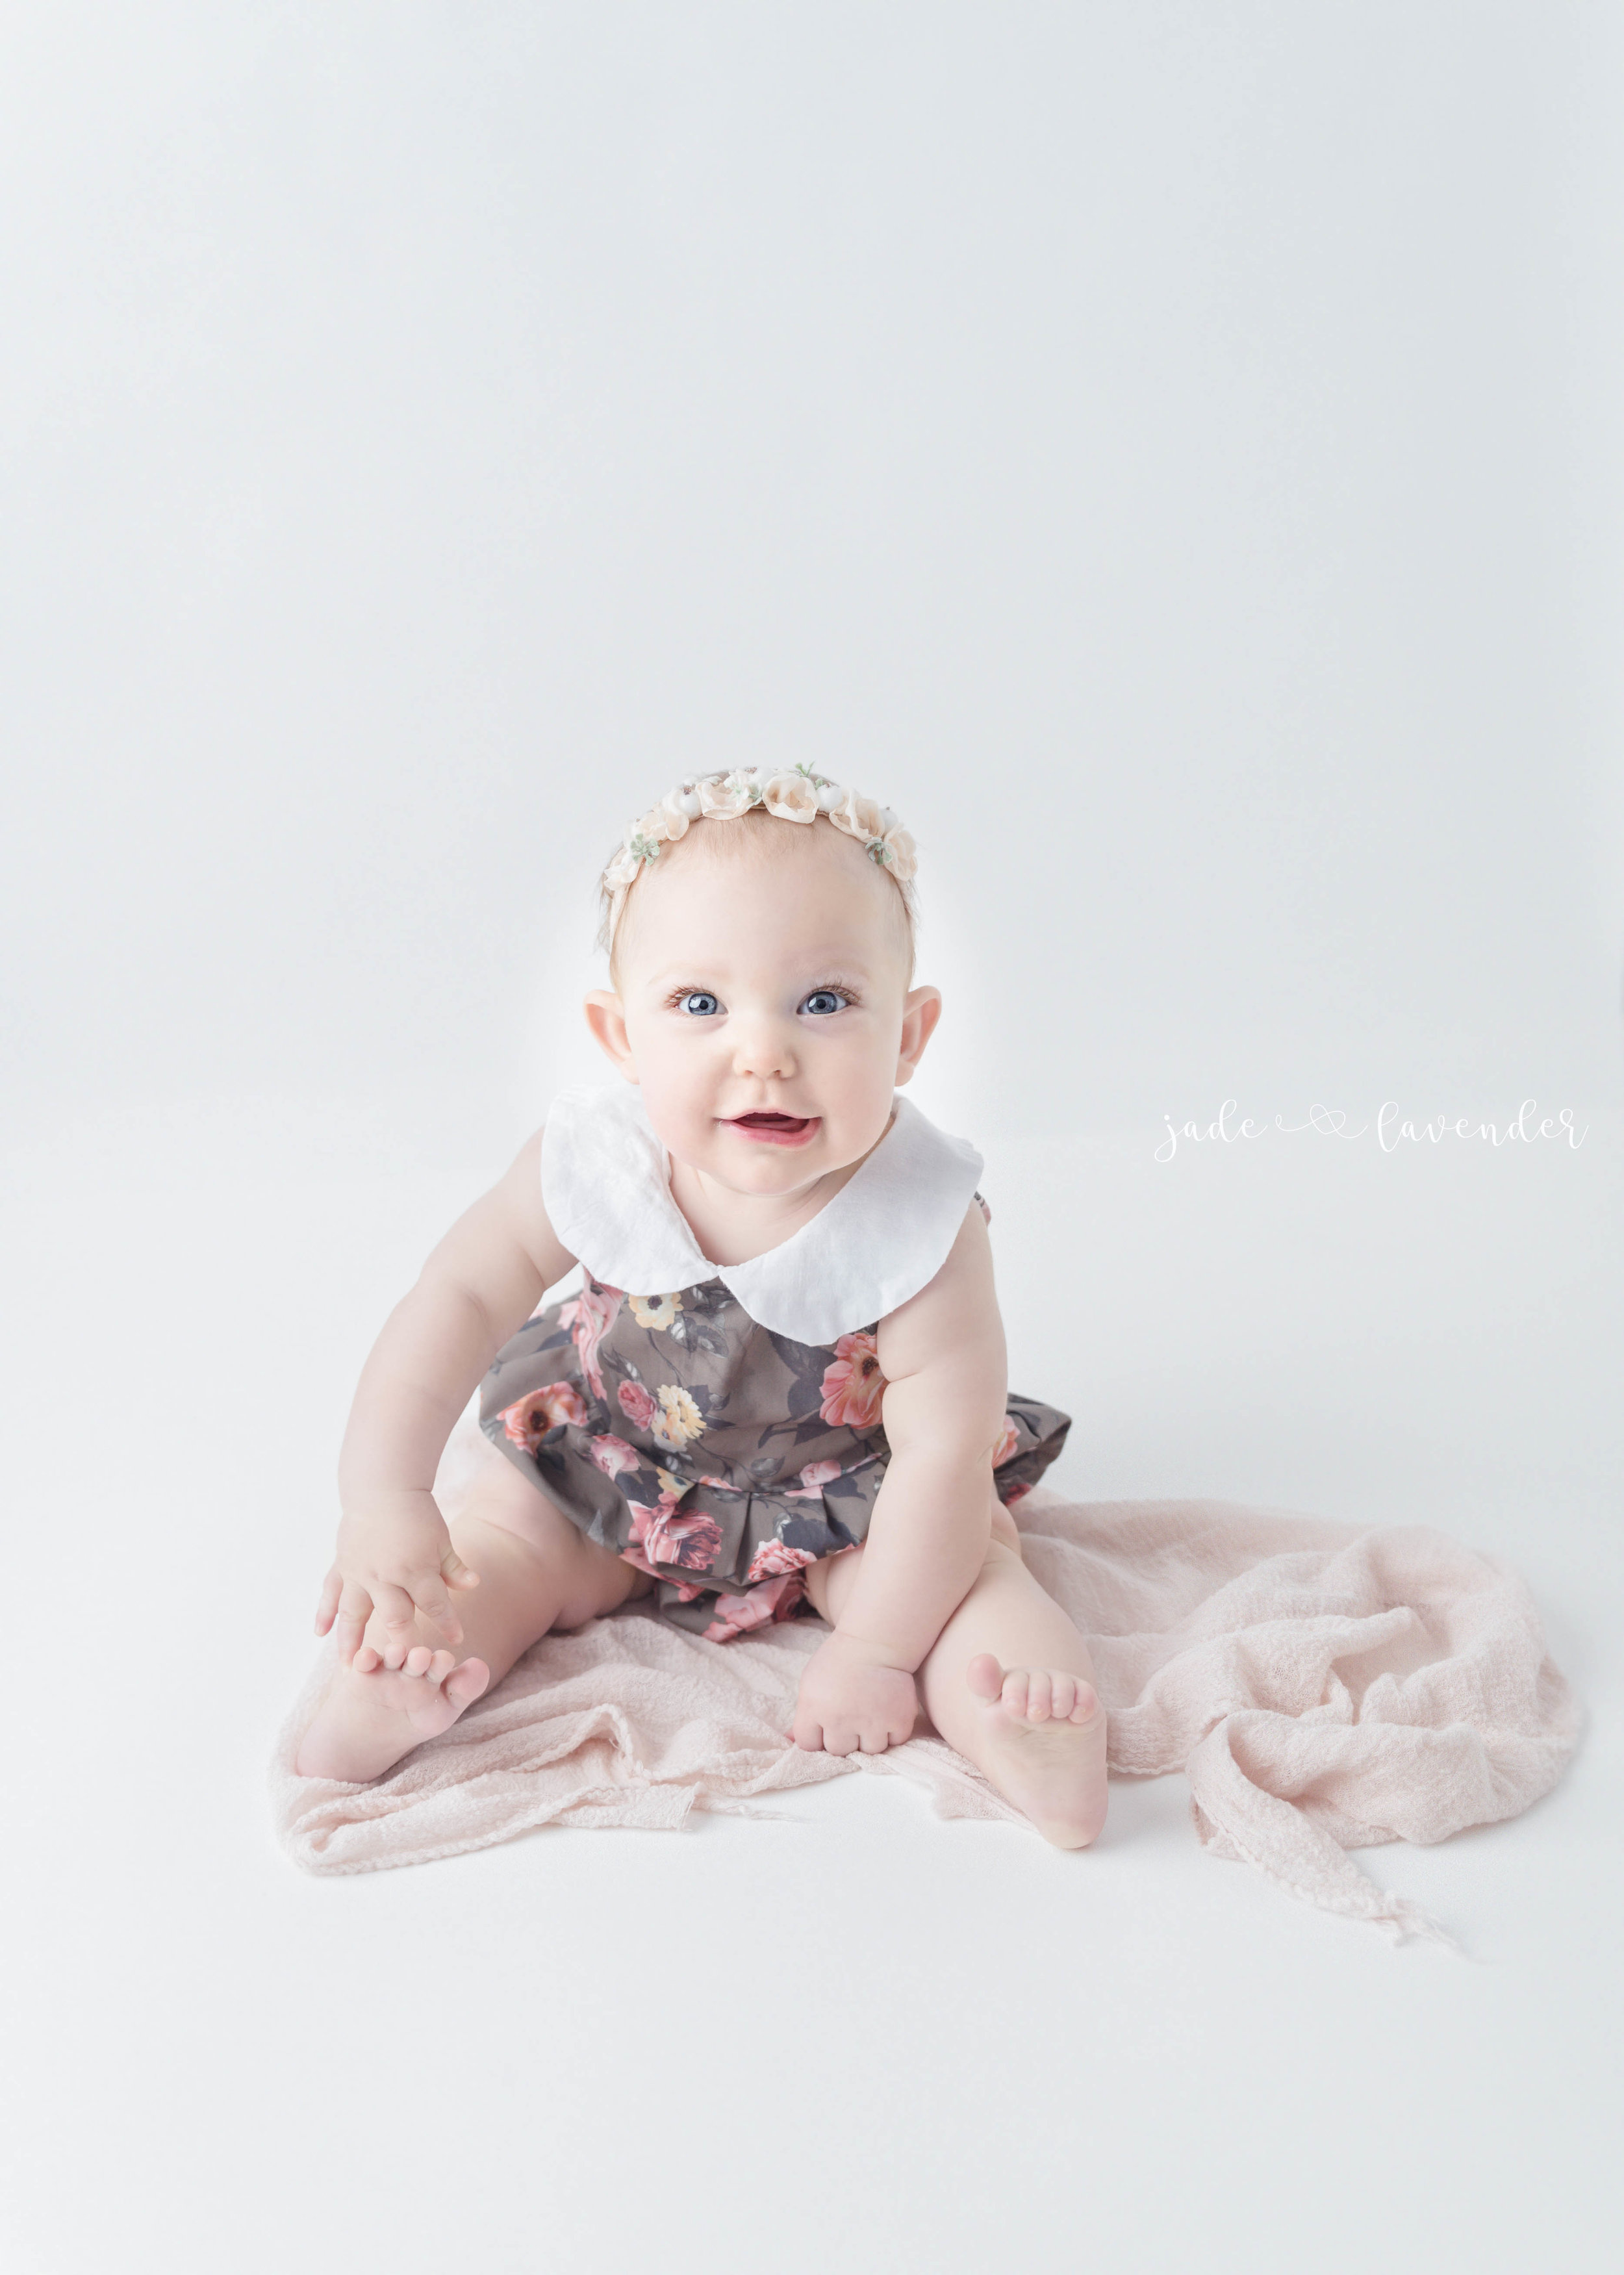 milk-bath-photography-baby-images-milestone-photography-spokane-washington.jpg